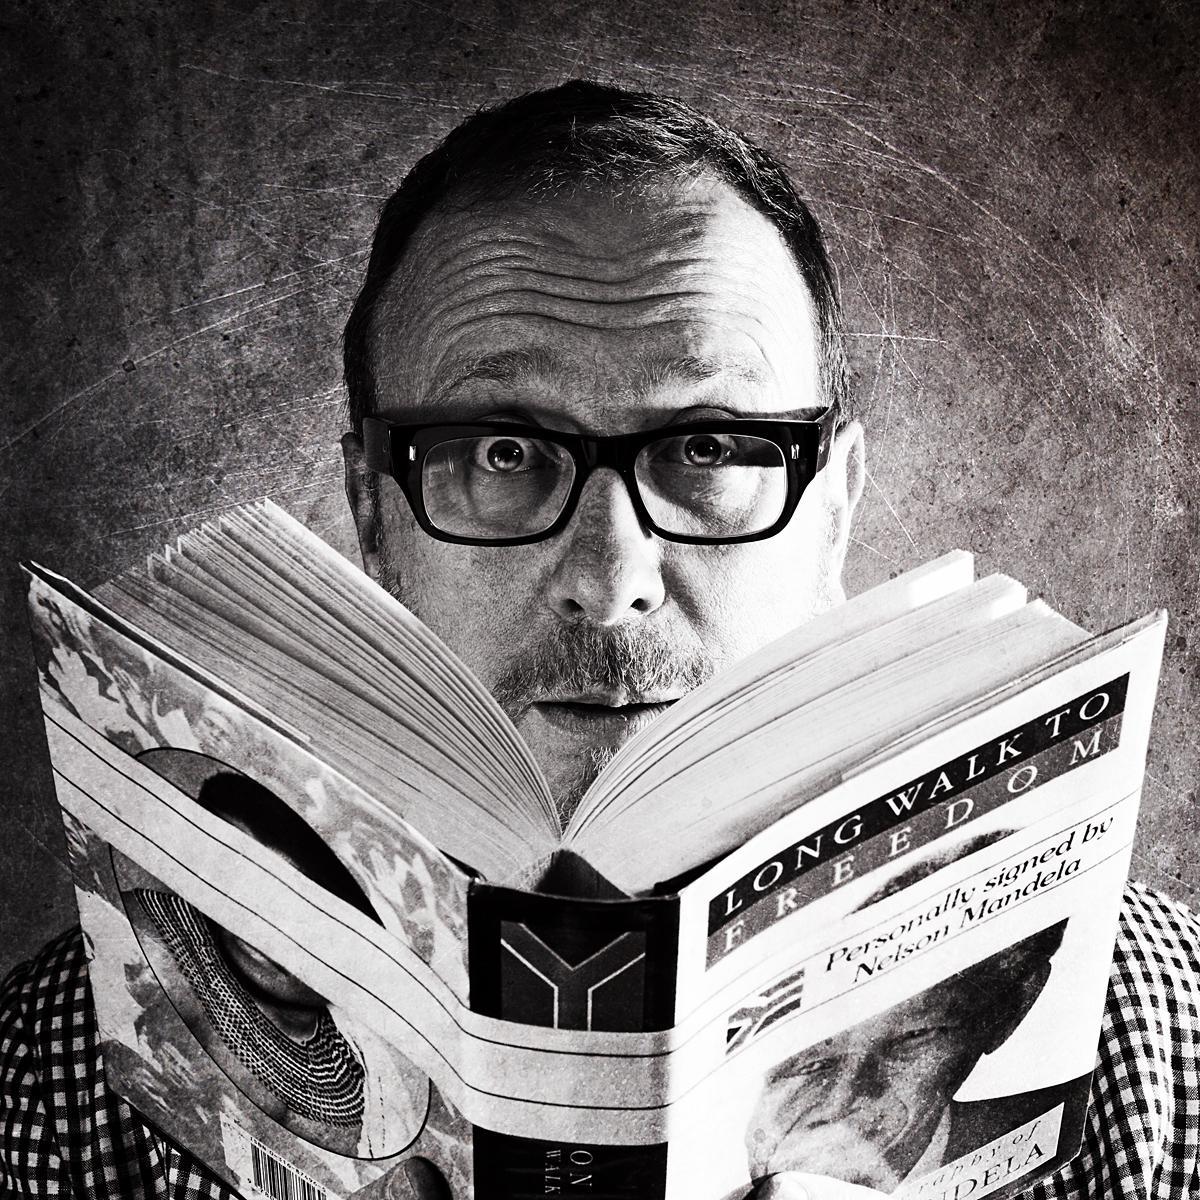 Portrait of Neil Dawson, Exec Creative Director, Nissan United/TBWA by photographer Julian Hanford